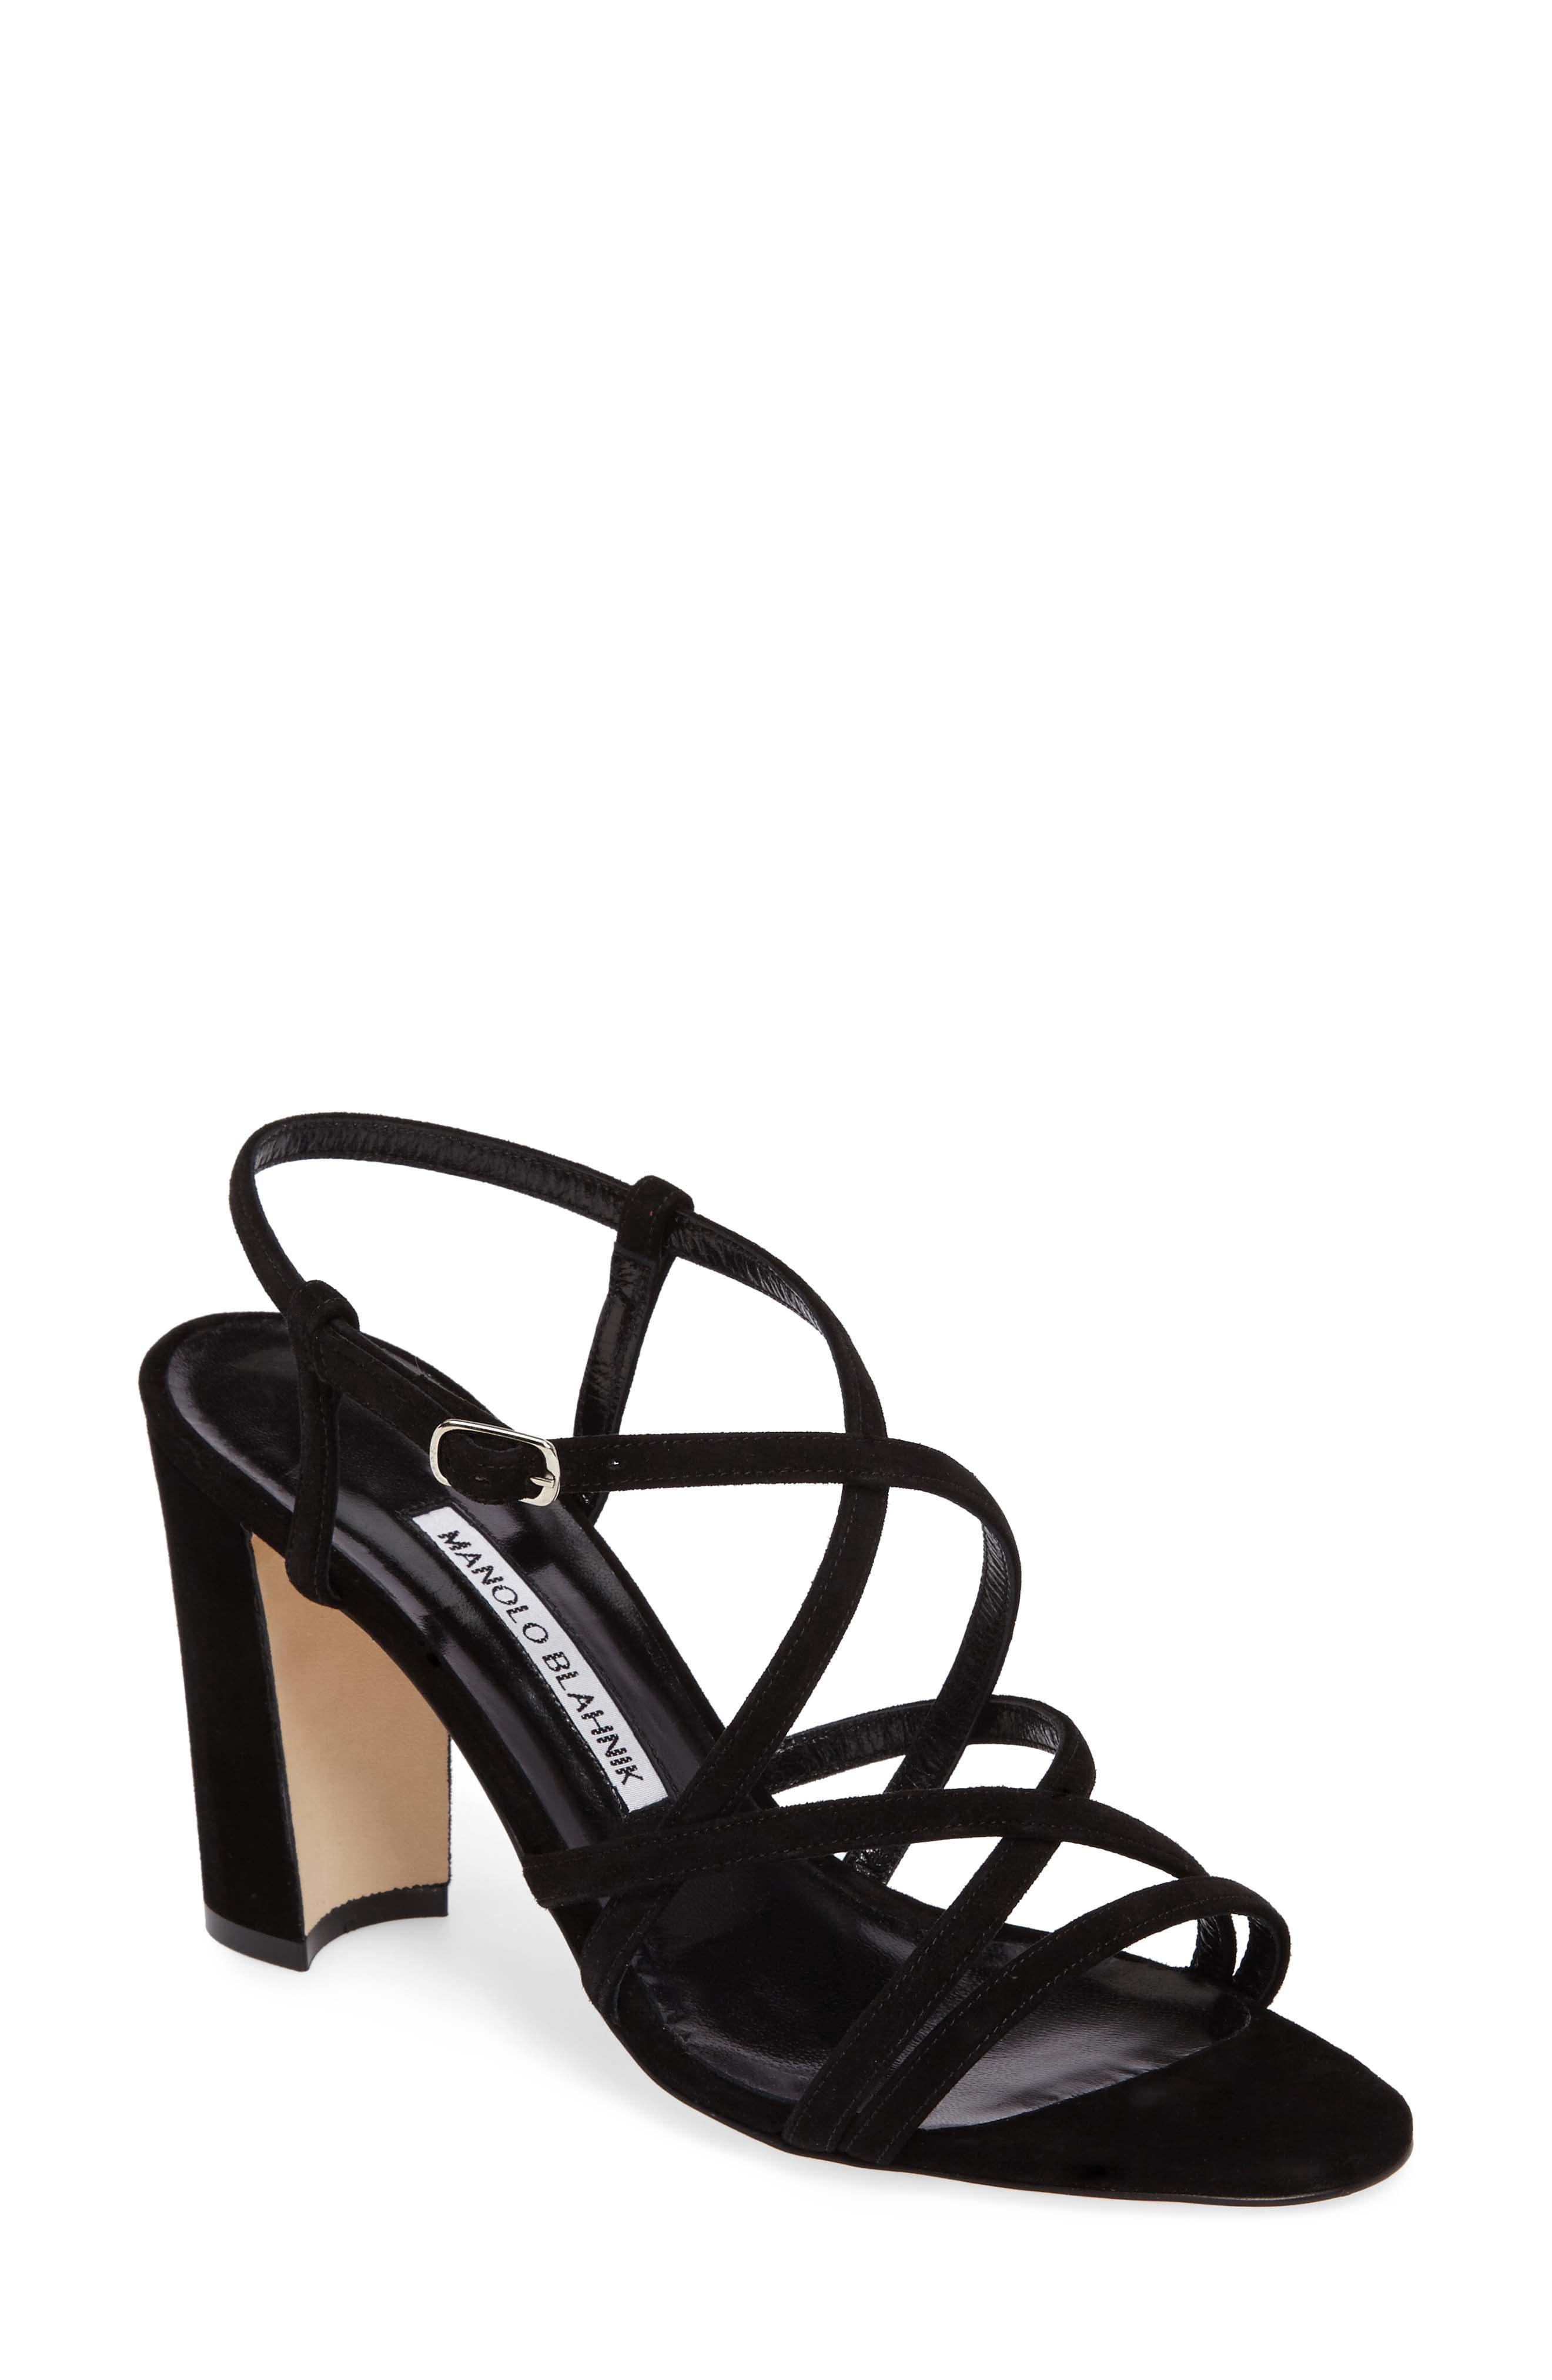 Alternate Image 1 Selected - Manolo Blahnik Atrita Sandal (Women)